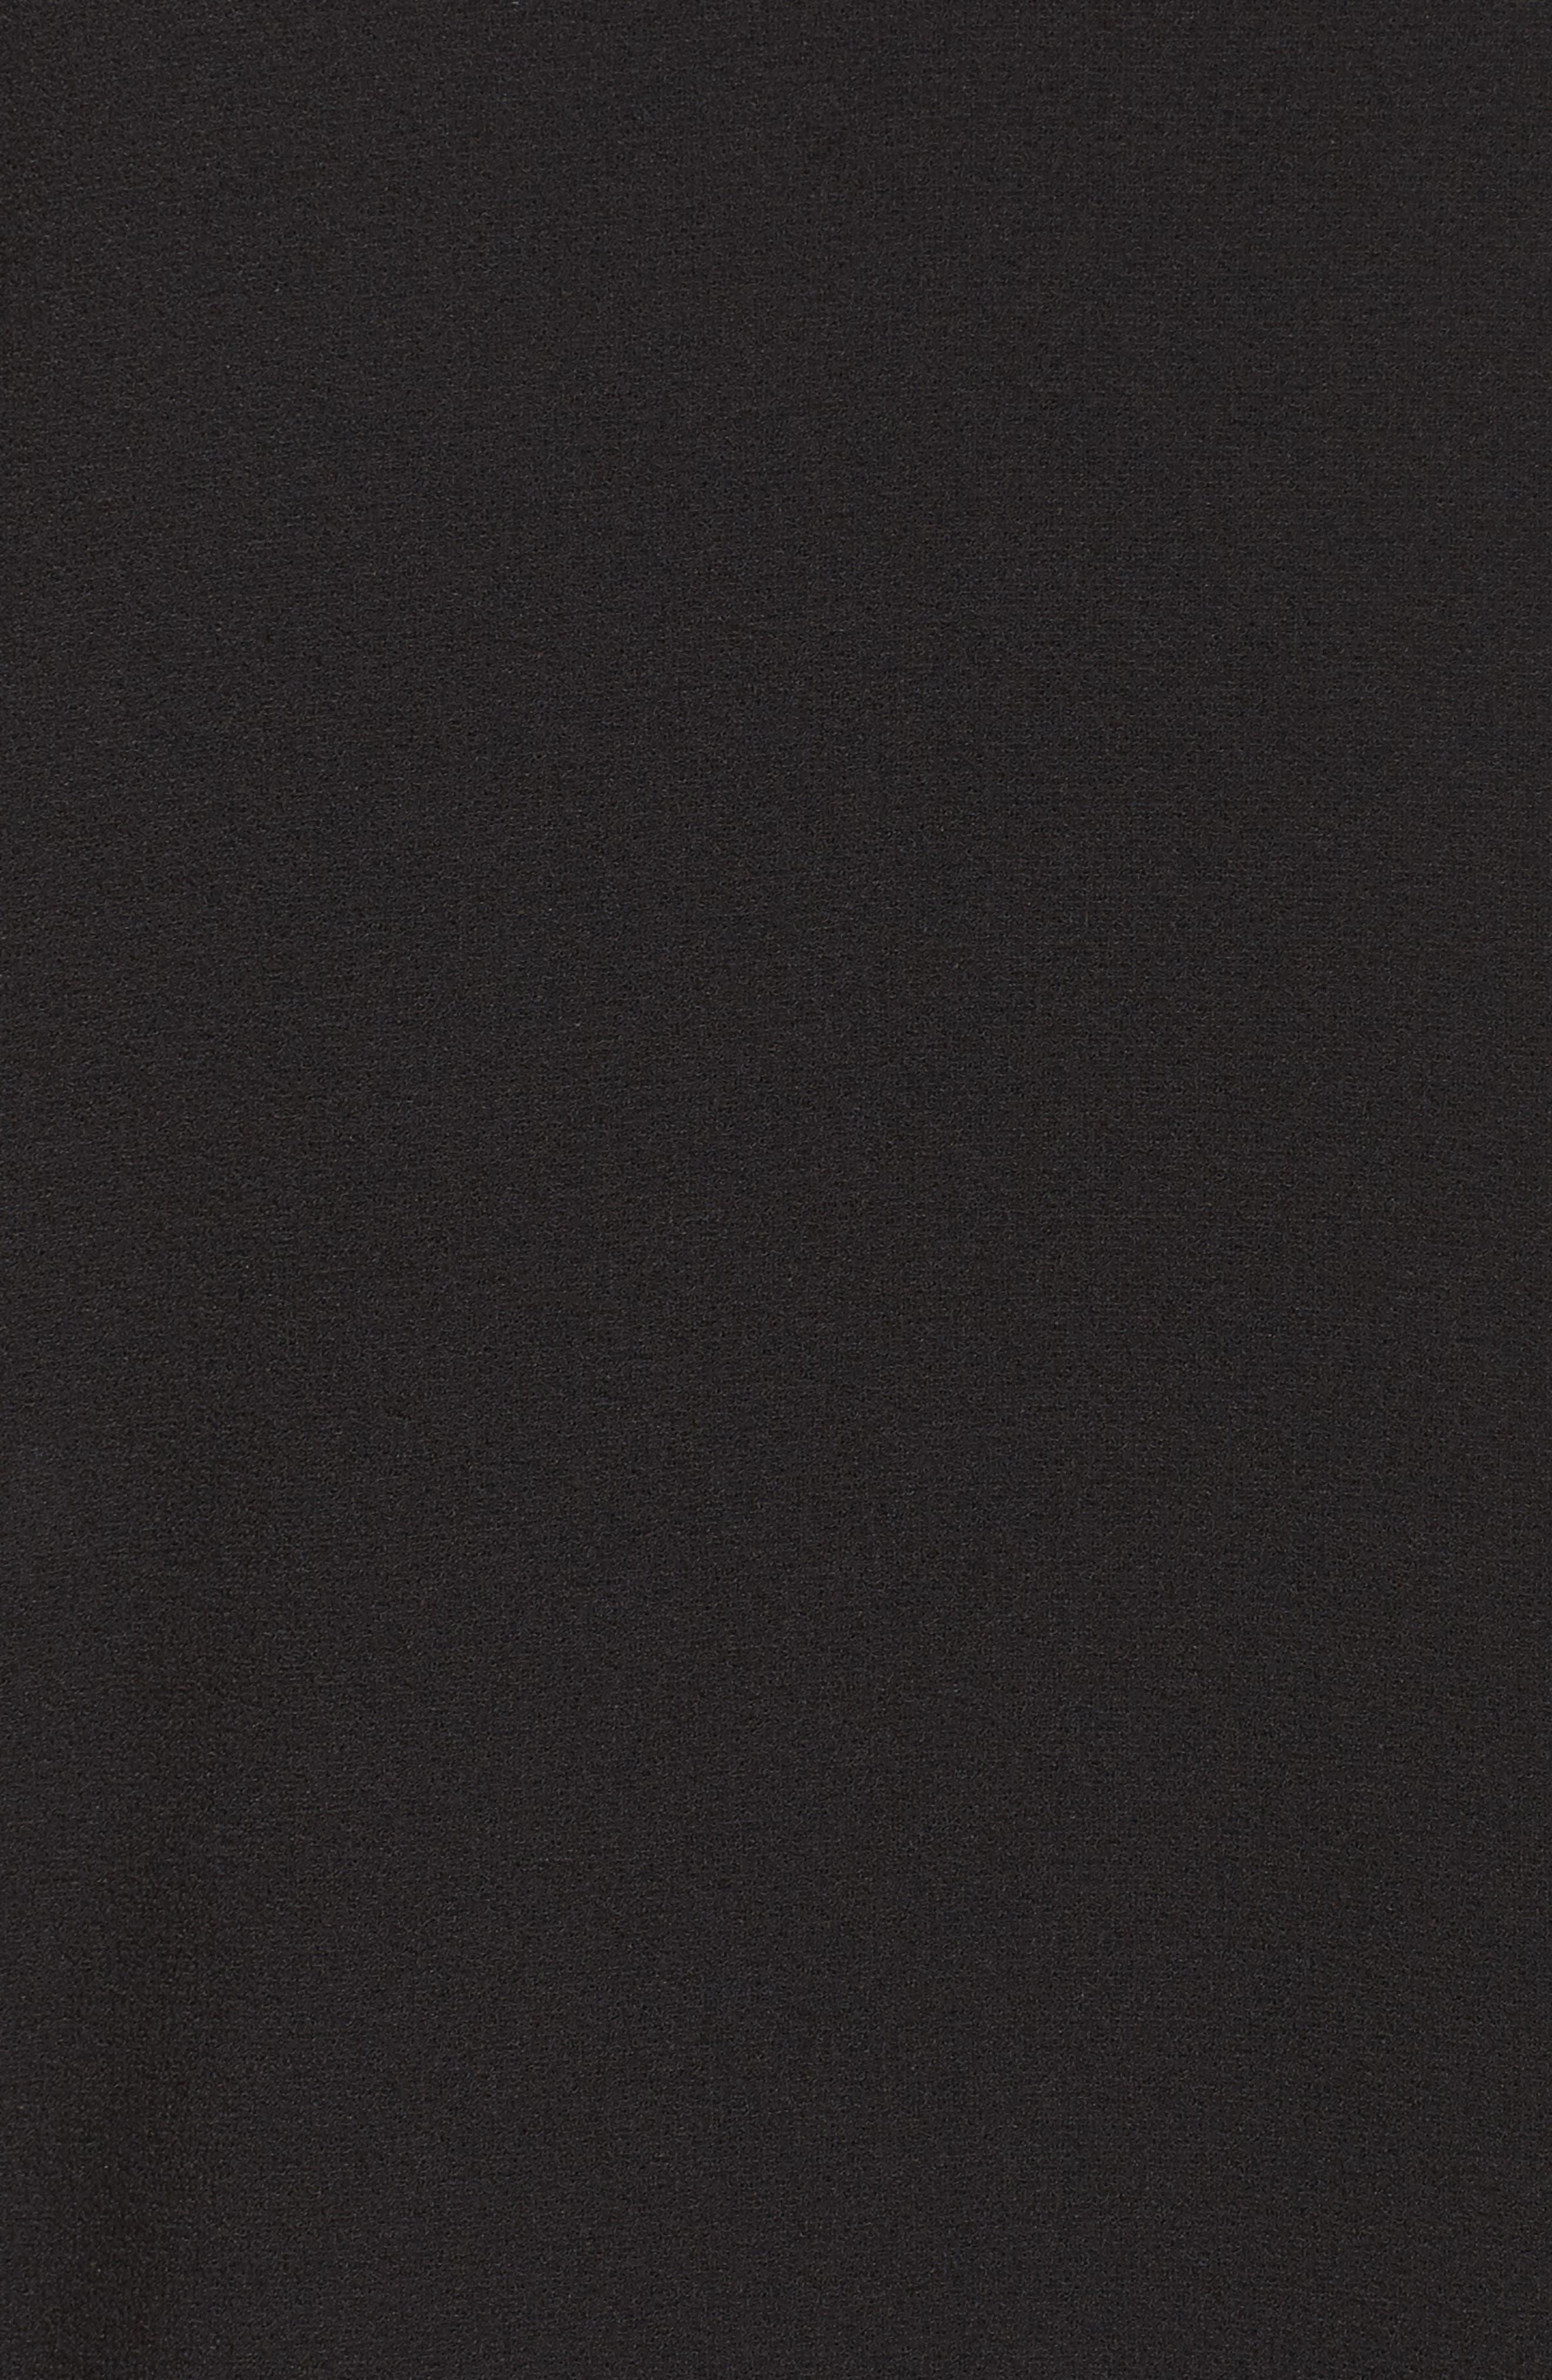 Tiered Ruffle Sleeve Dress,                             Alternate thumbnail 7, color,                             BLACK